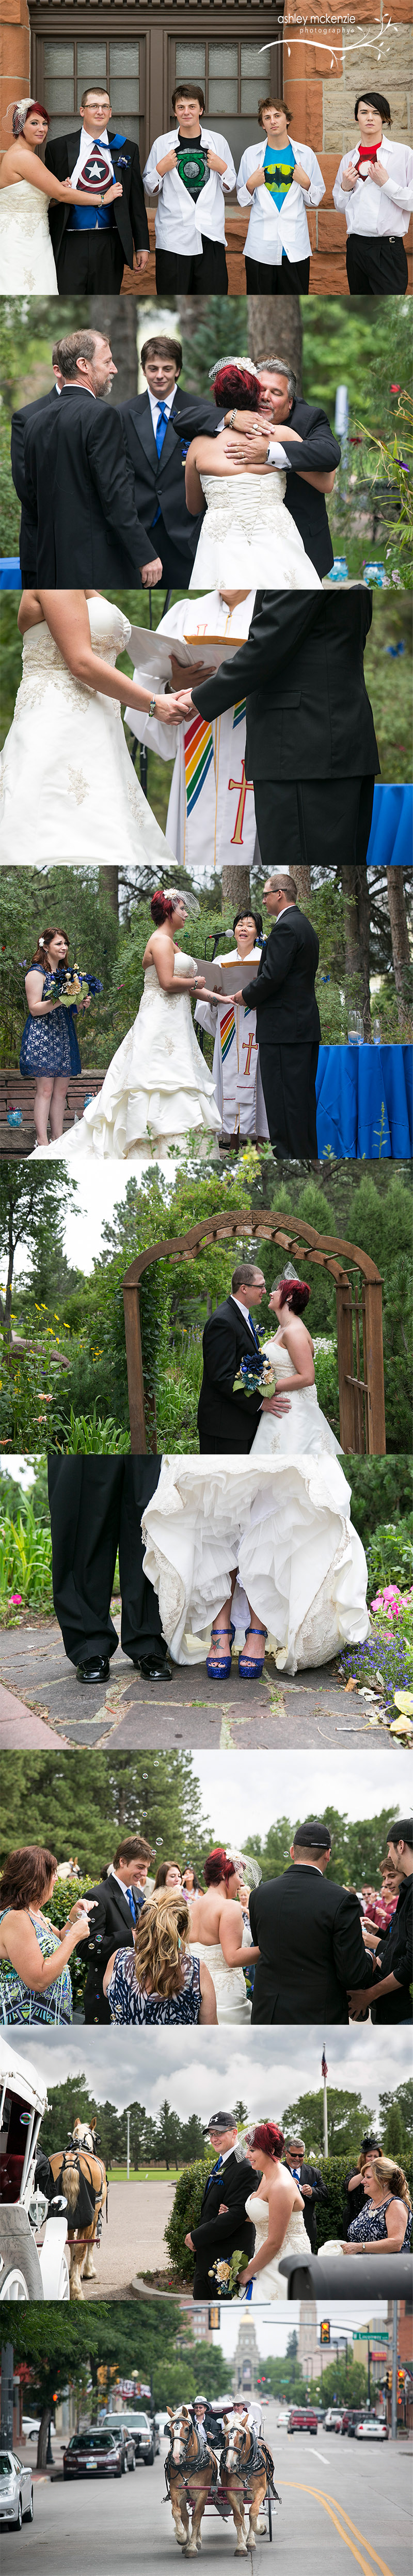 Wedding Photography by Ashley Mckenzie Photography in Cheyenne, Wyoming